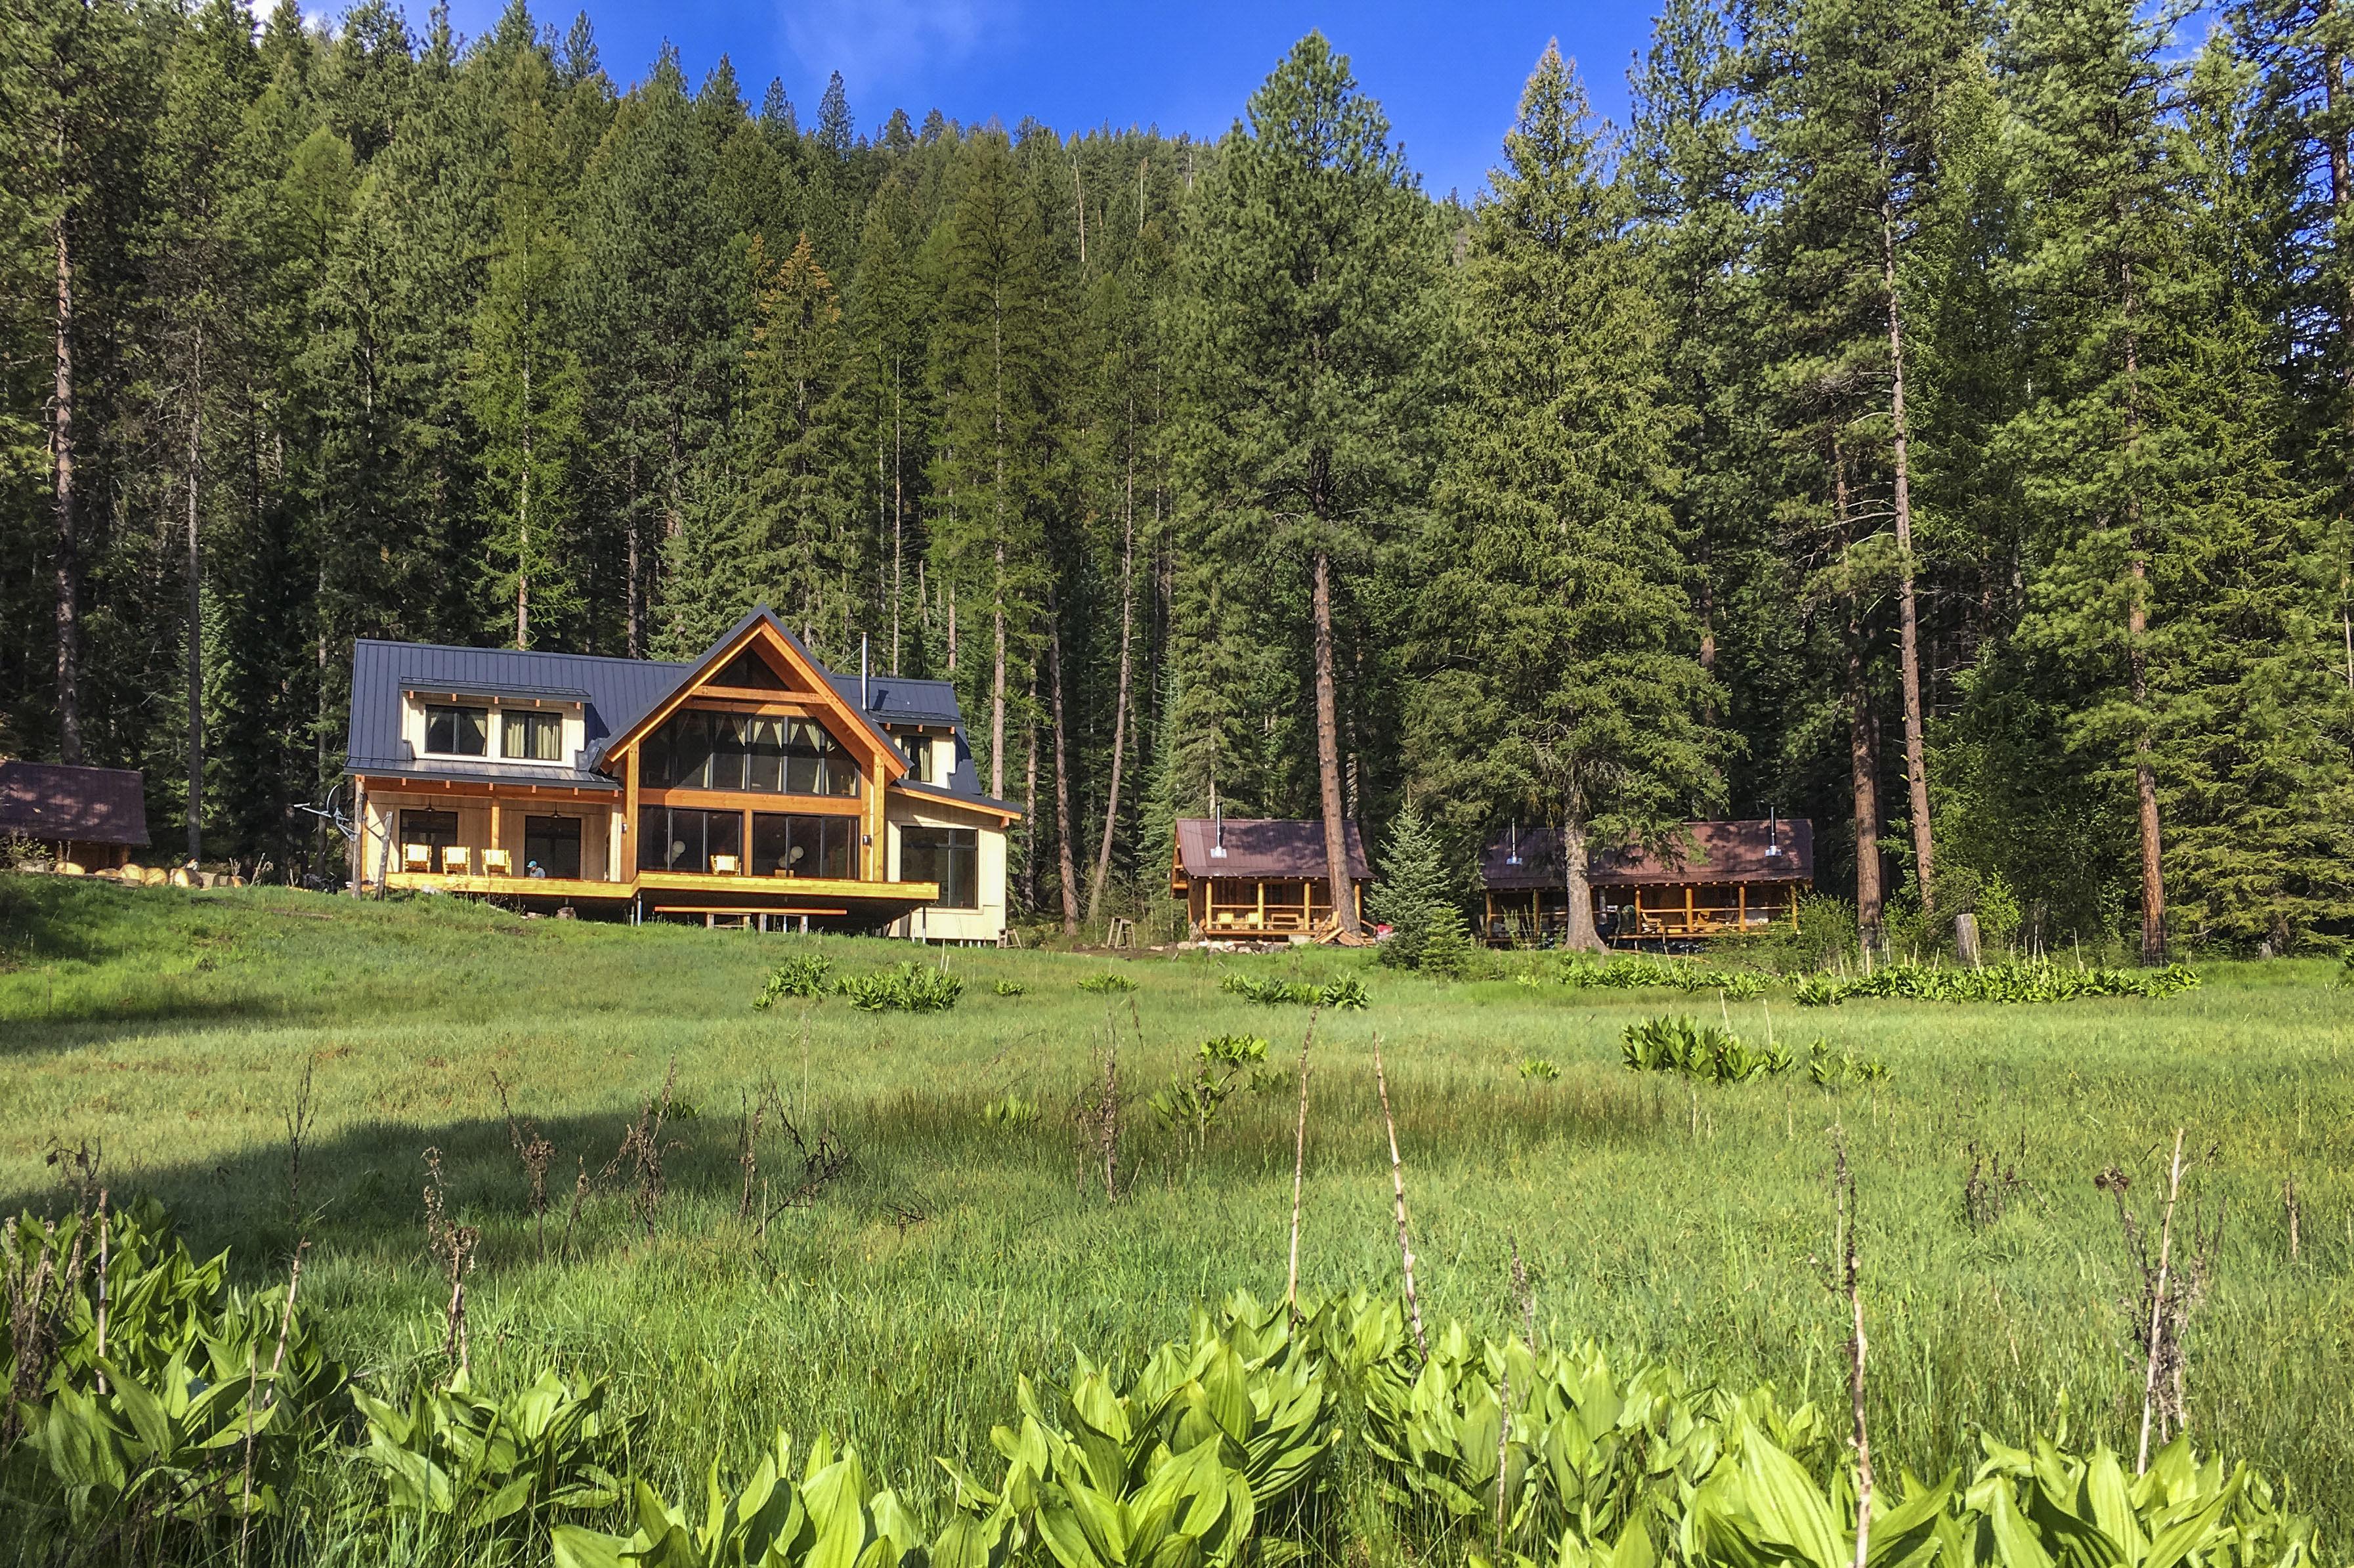 Lodge and cabins evan schnider fx8ibz